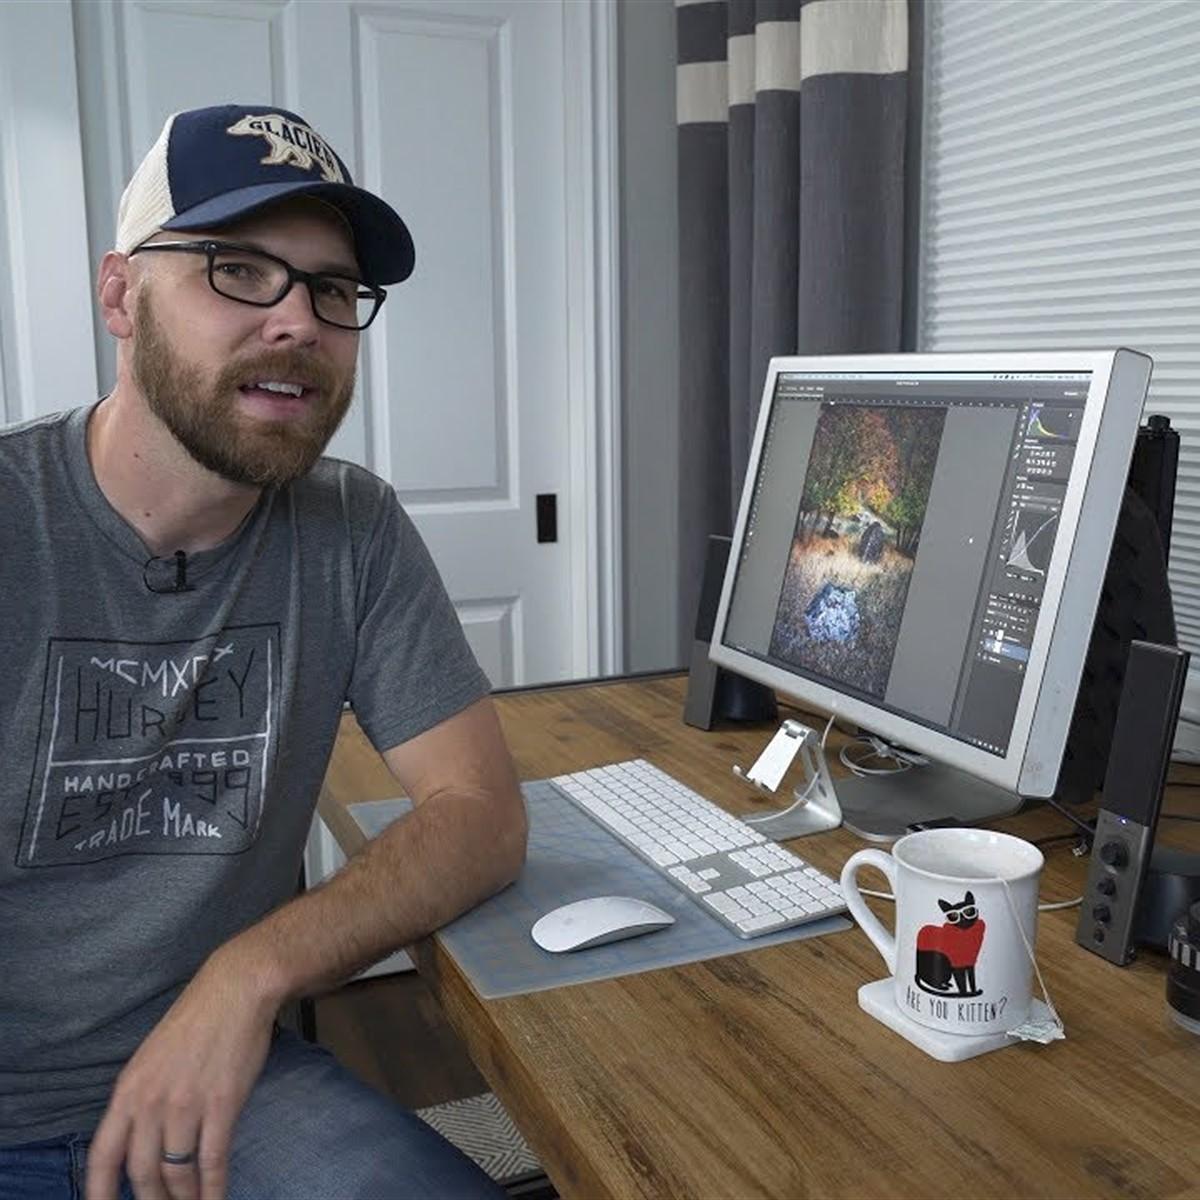 Encouraging Print Pixels 8x10 Slide Digital Photographyreview Moar Pixel Peeping A Drum Scan Pixels Slide Film 8x10 Paper Pixel Peeping A Drum Scan dpreview 8x10 In Pixels